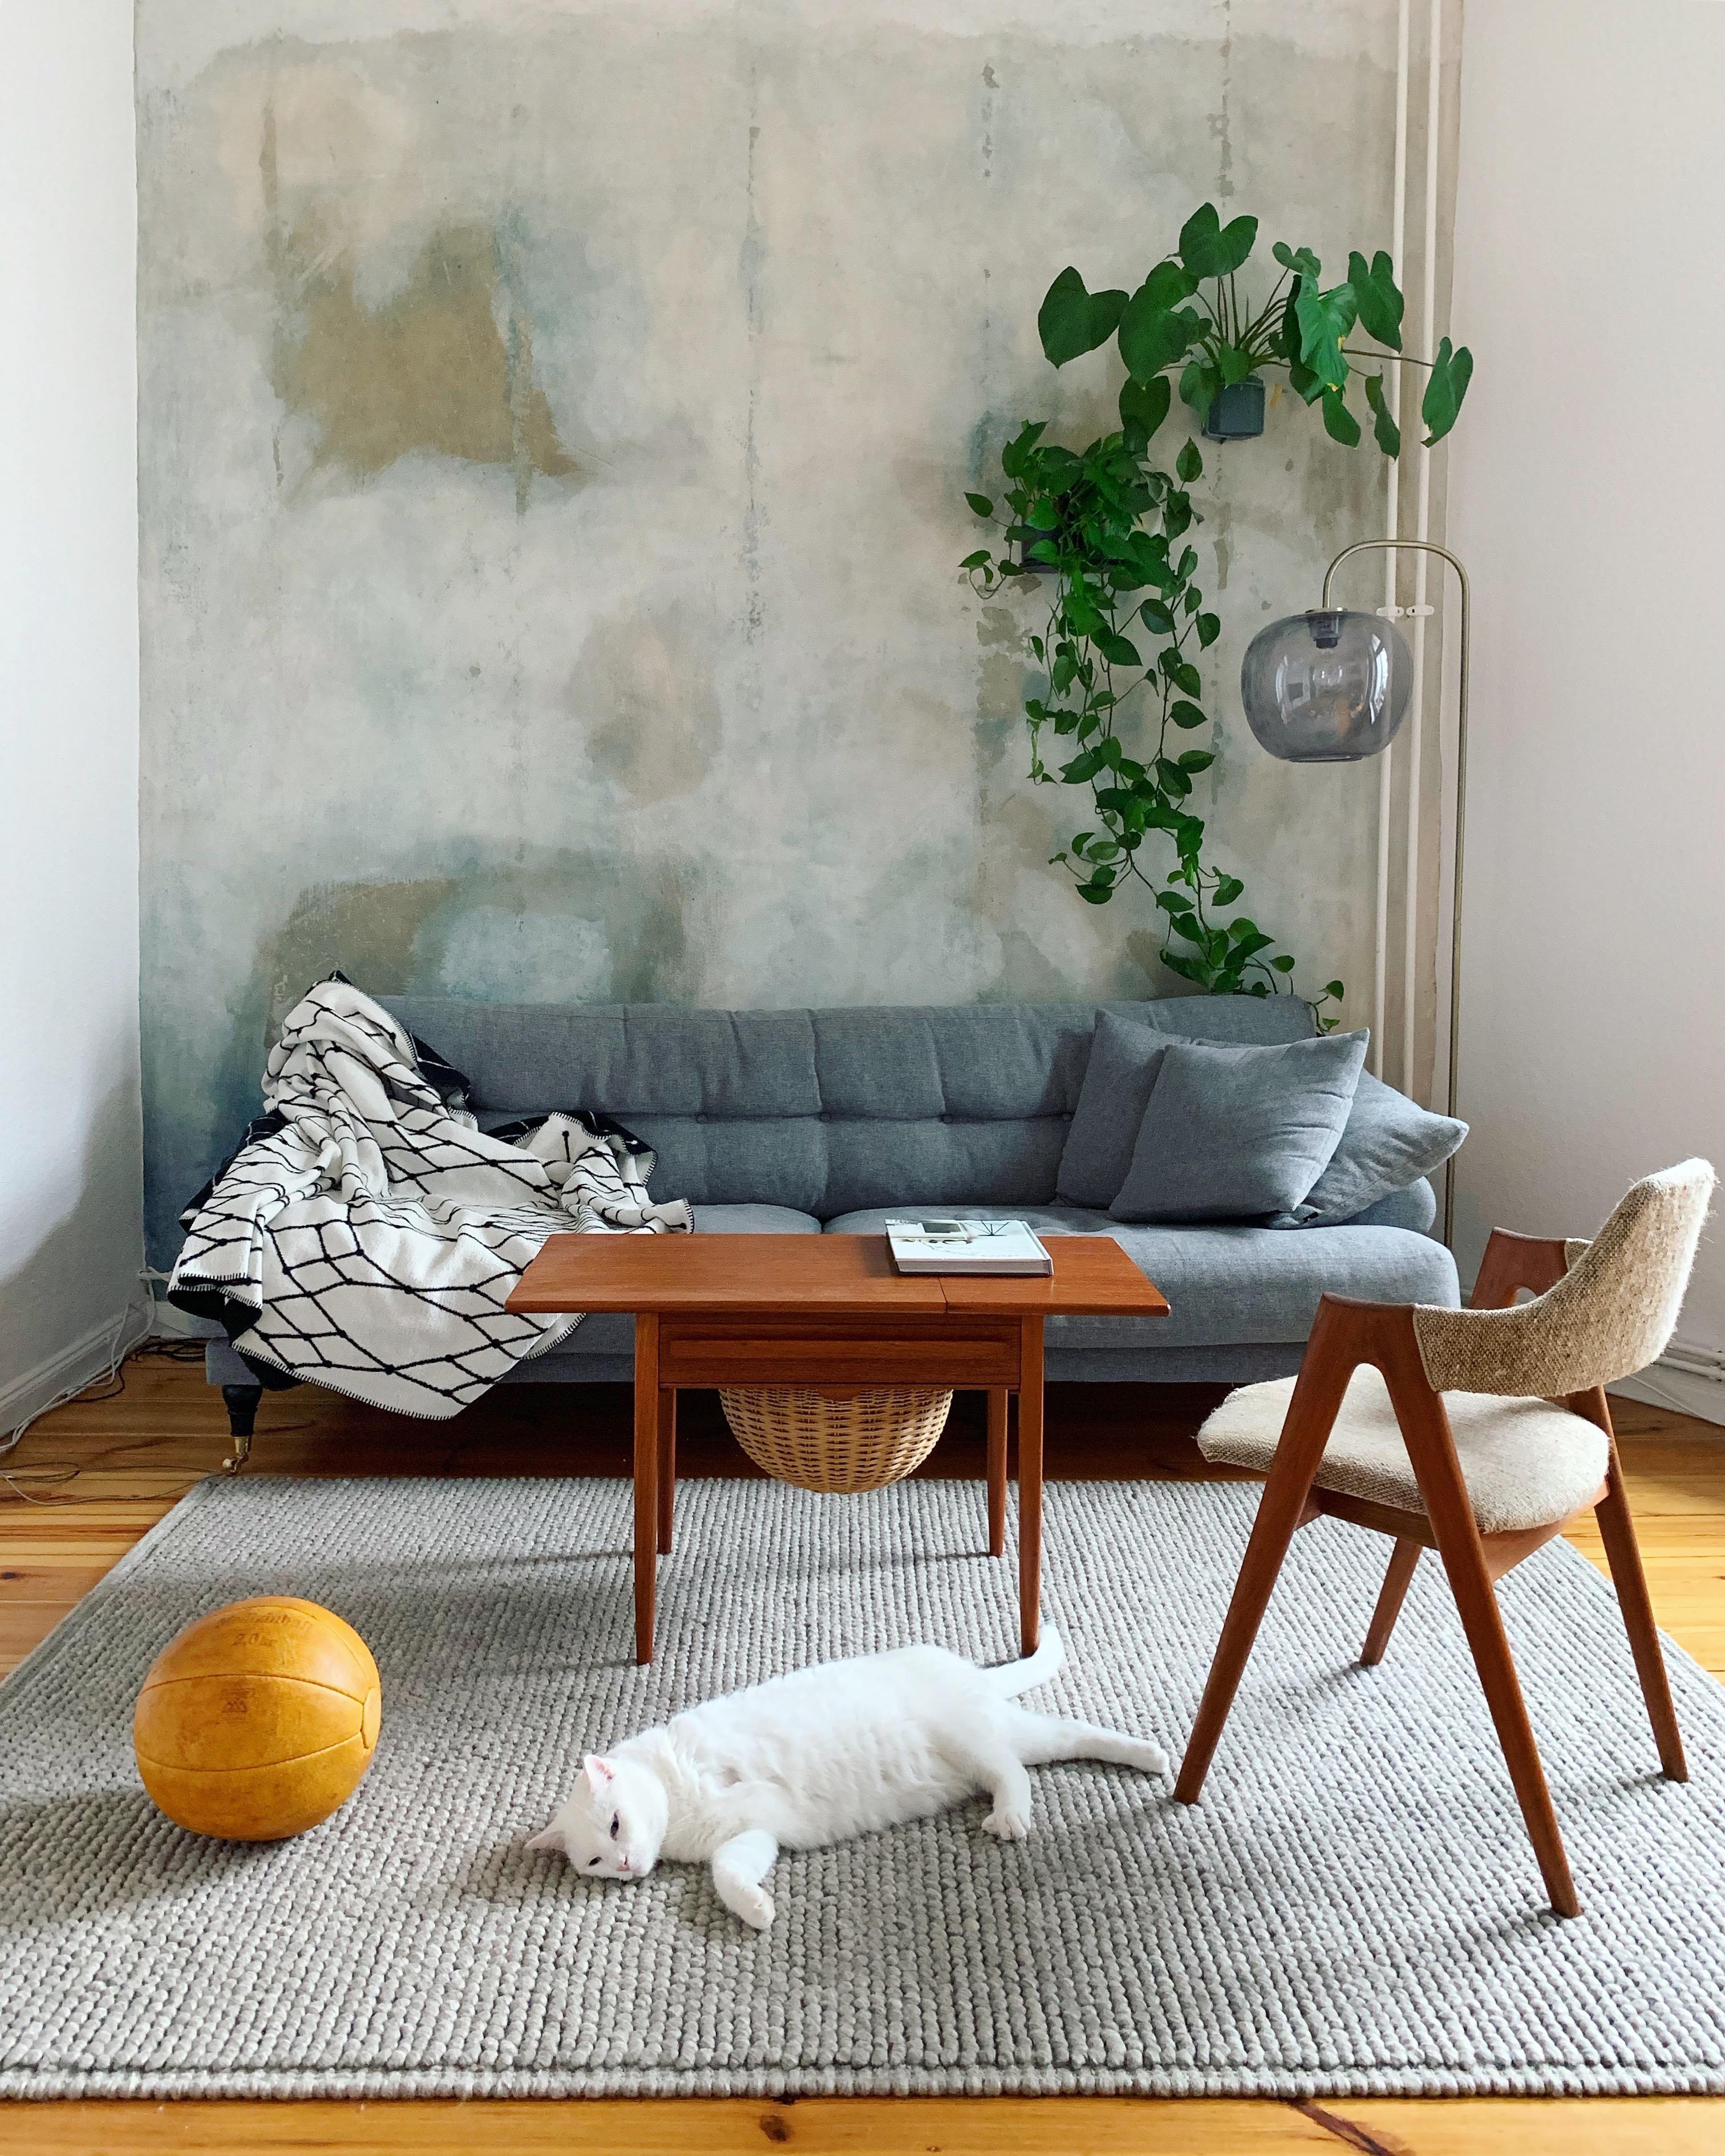 Wohnzimmer Bilder: Lass dich inspirieren!